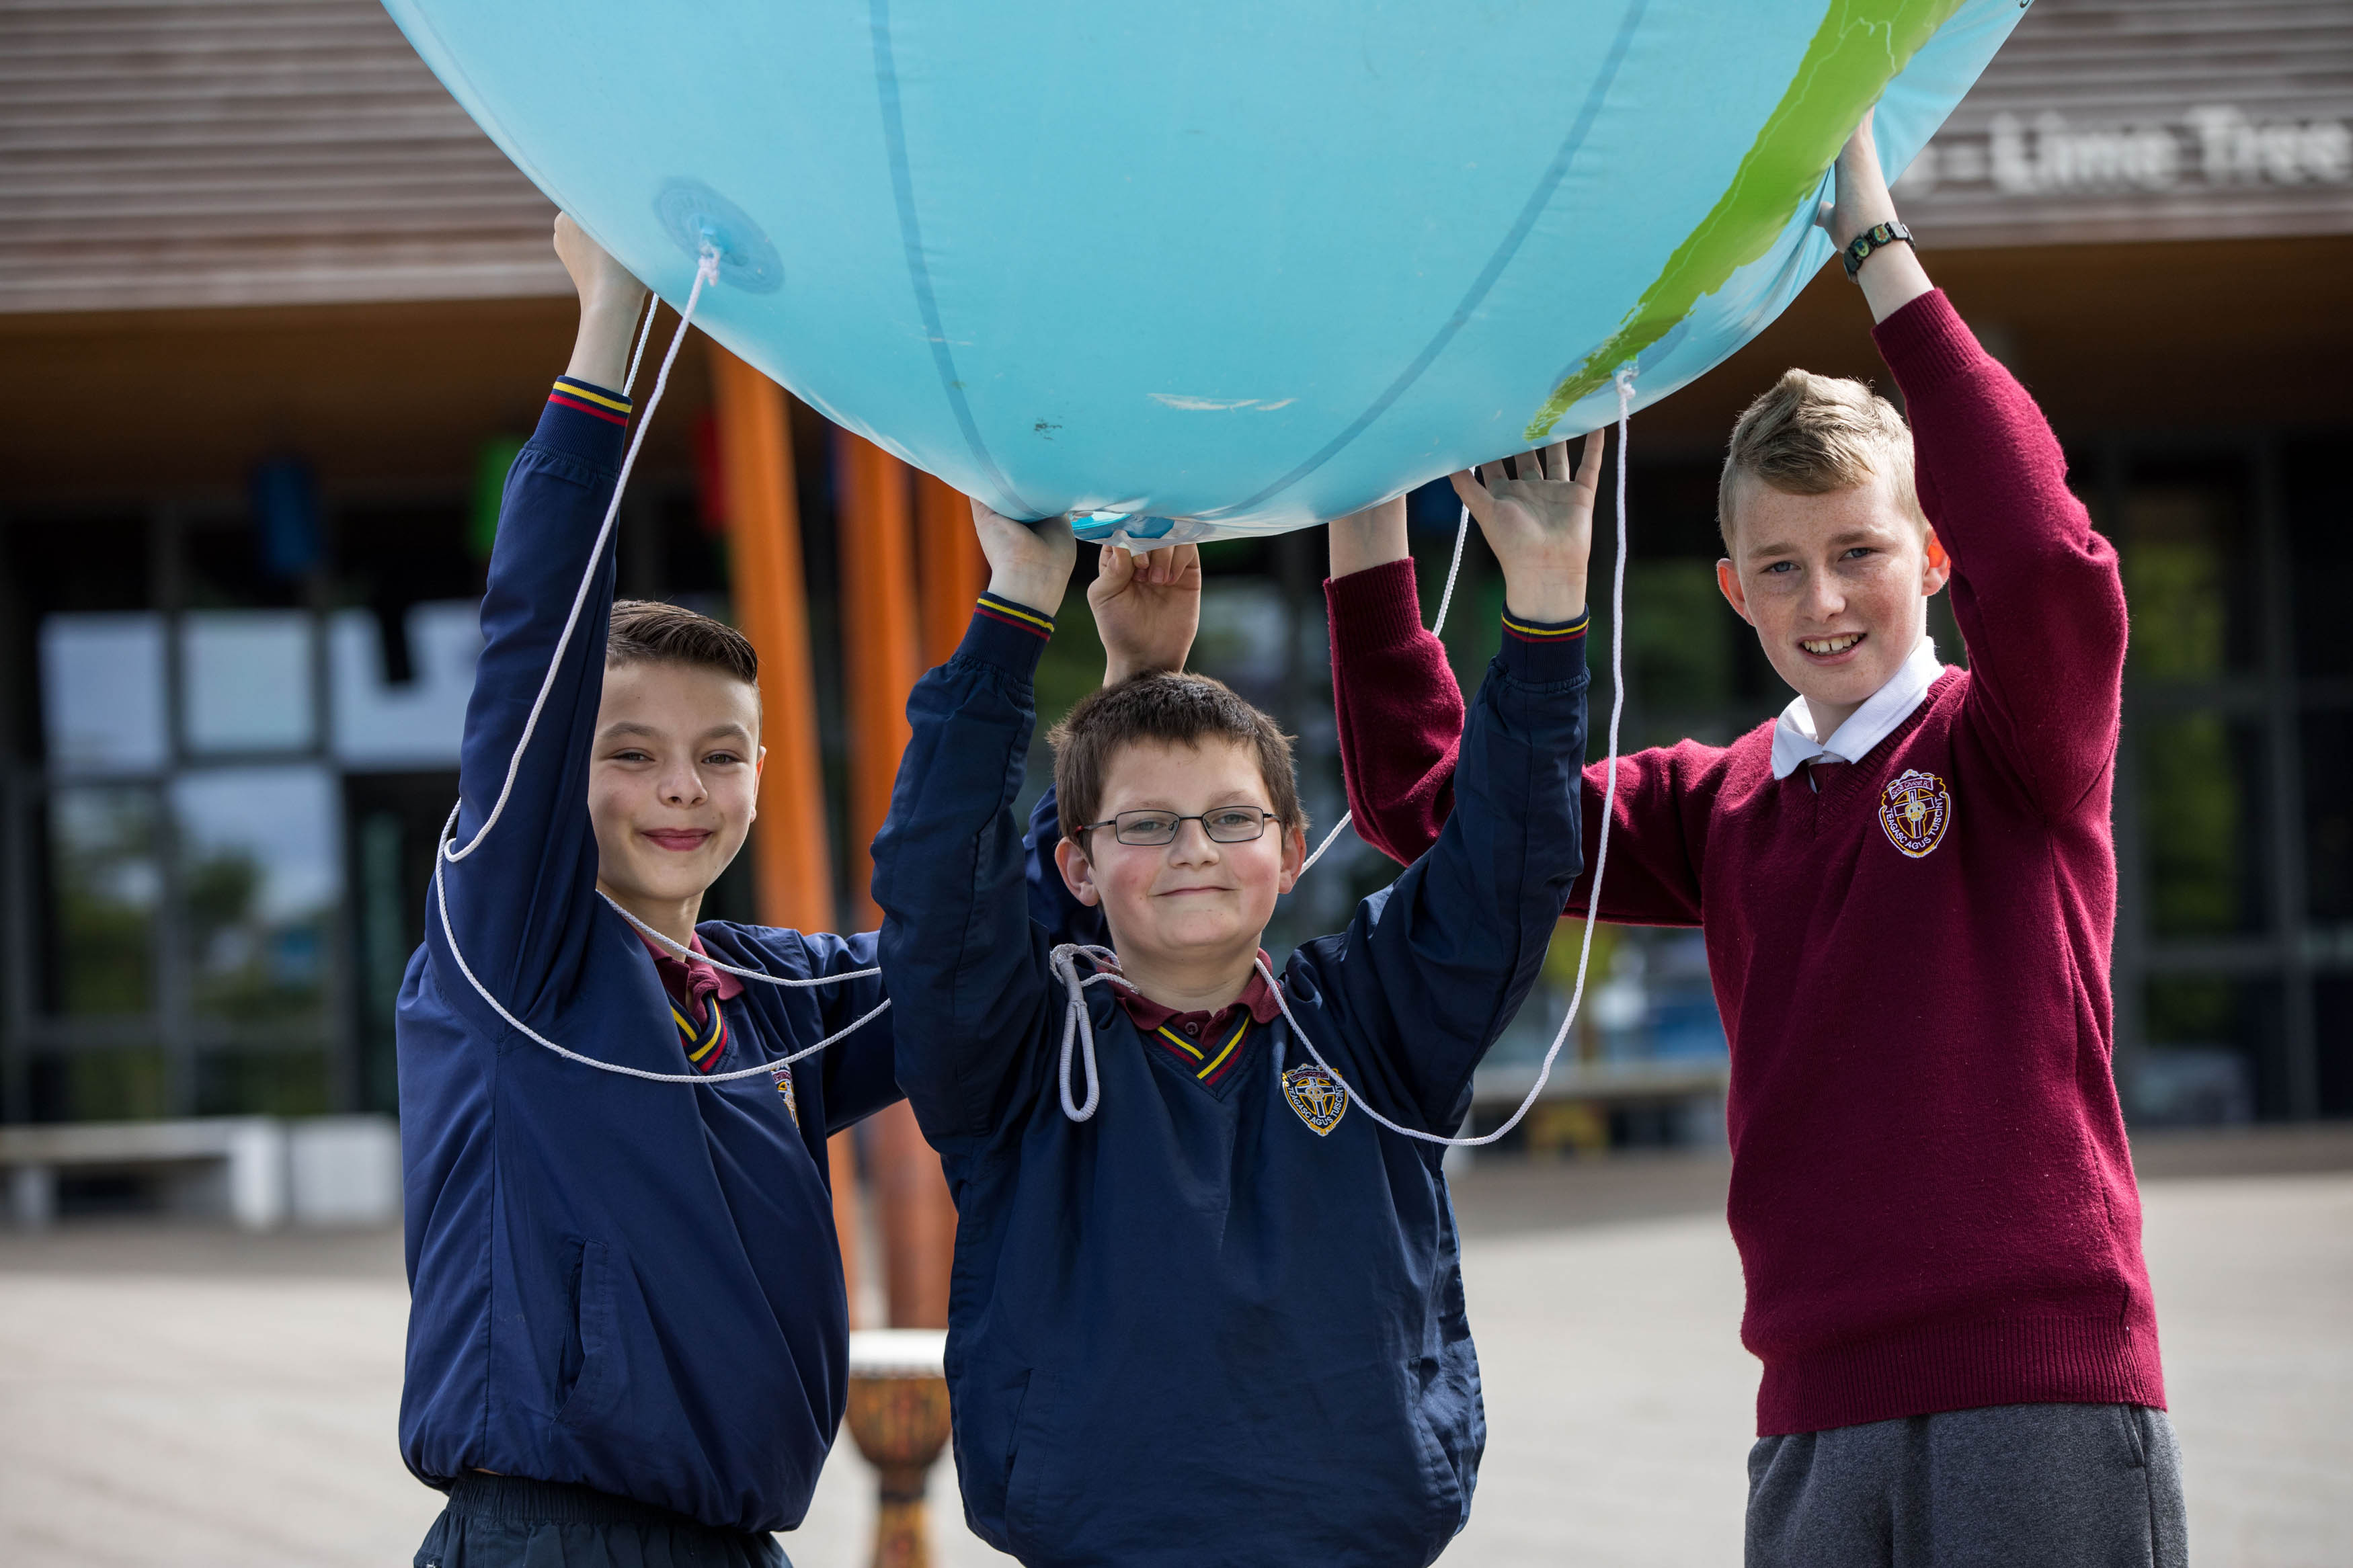 Our World Irish Aid Awards 2017